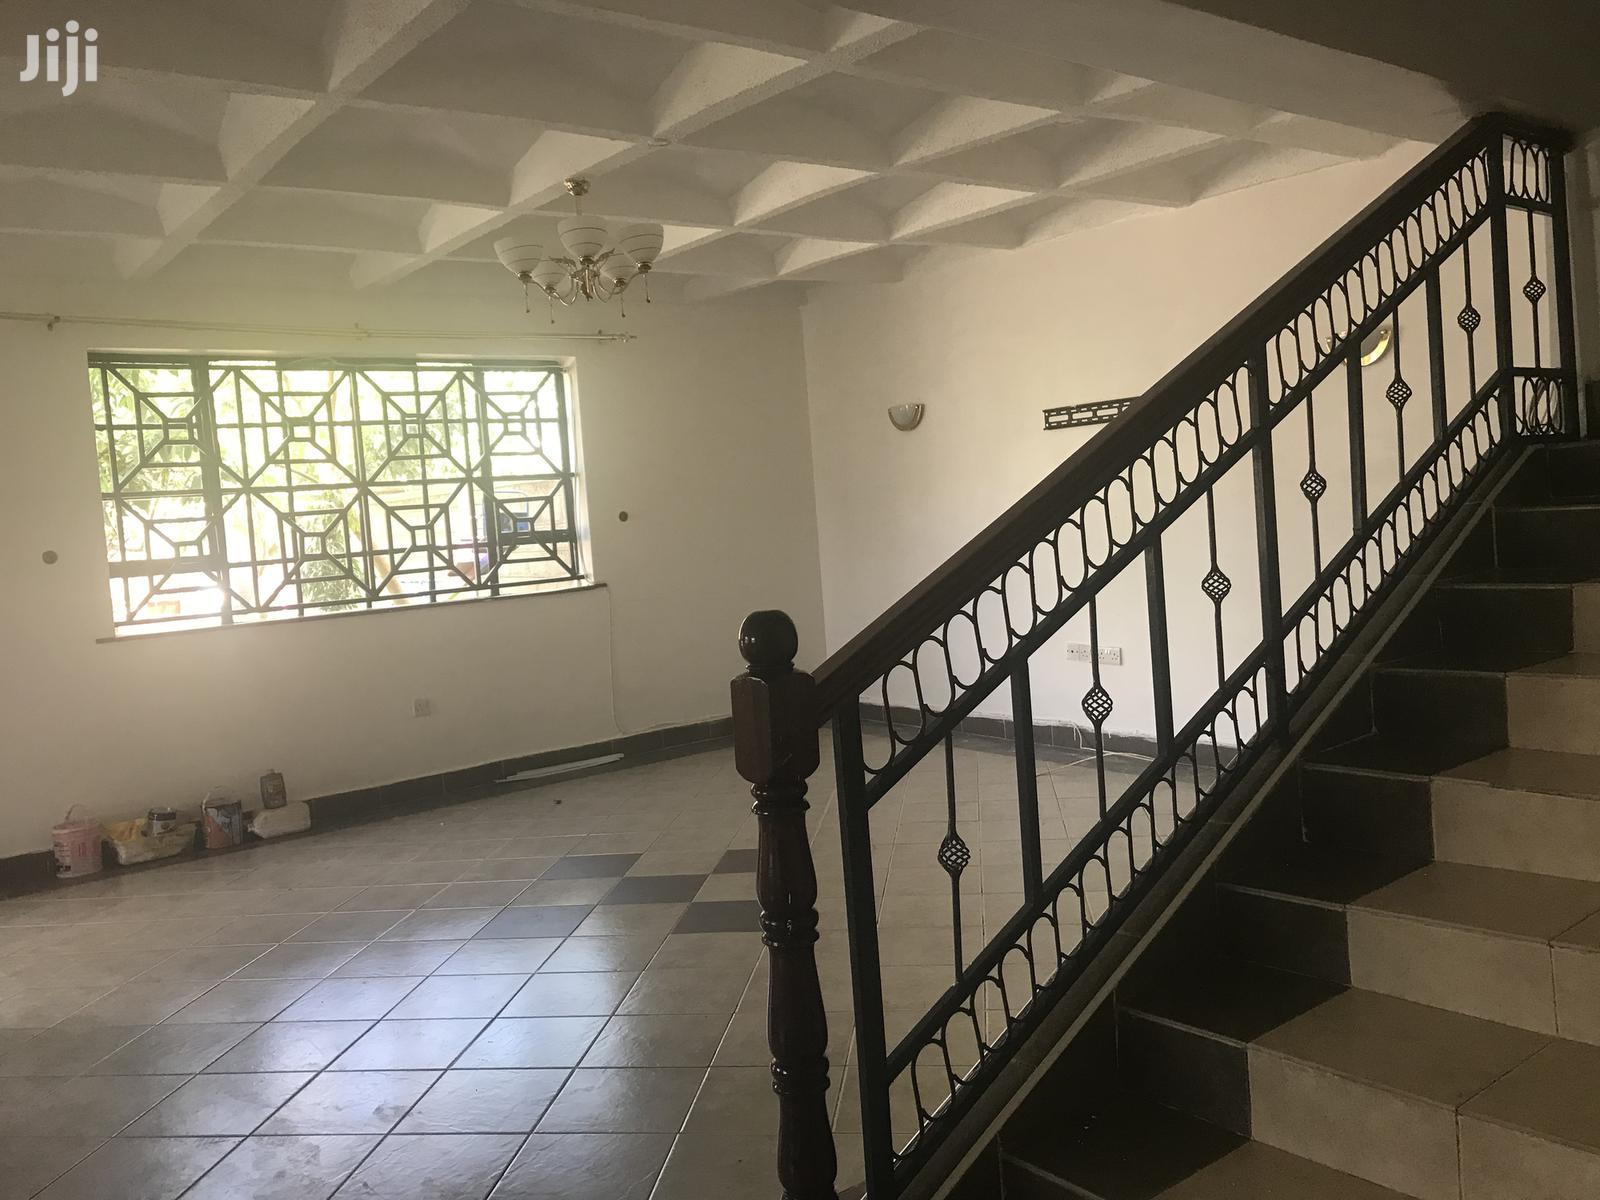 5bedroom Syokimau | Houses & Apartments For Rent for sale in Syokimau, Machakos, Kenya